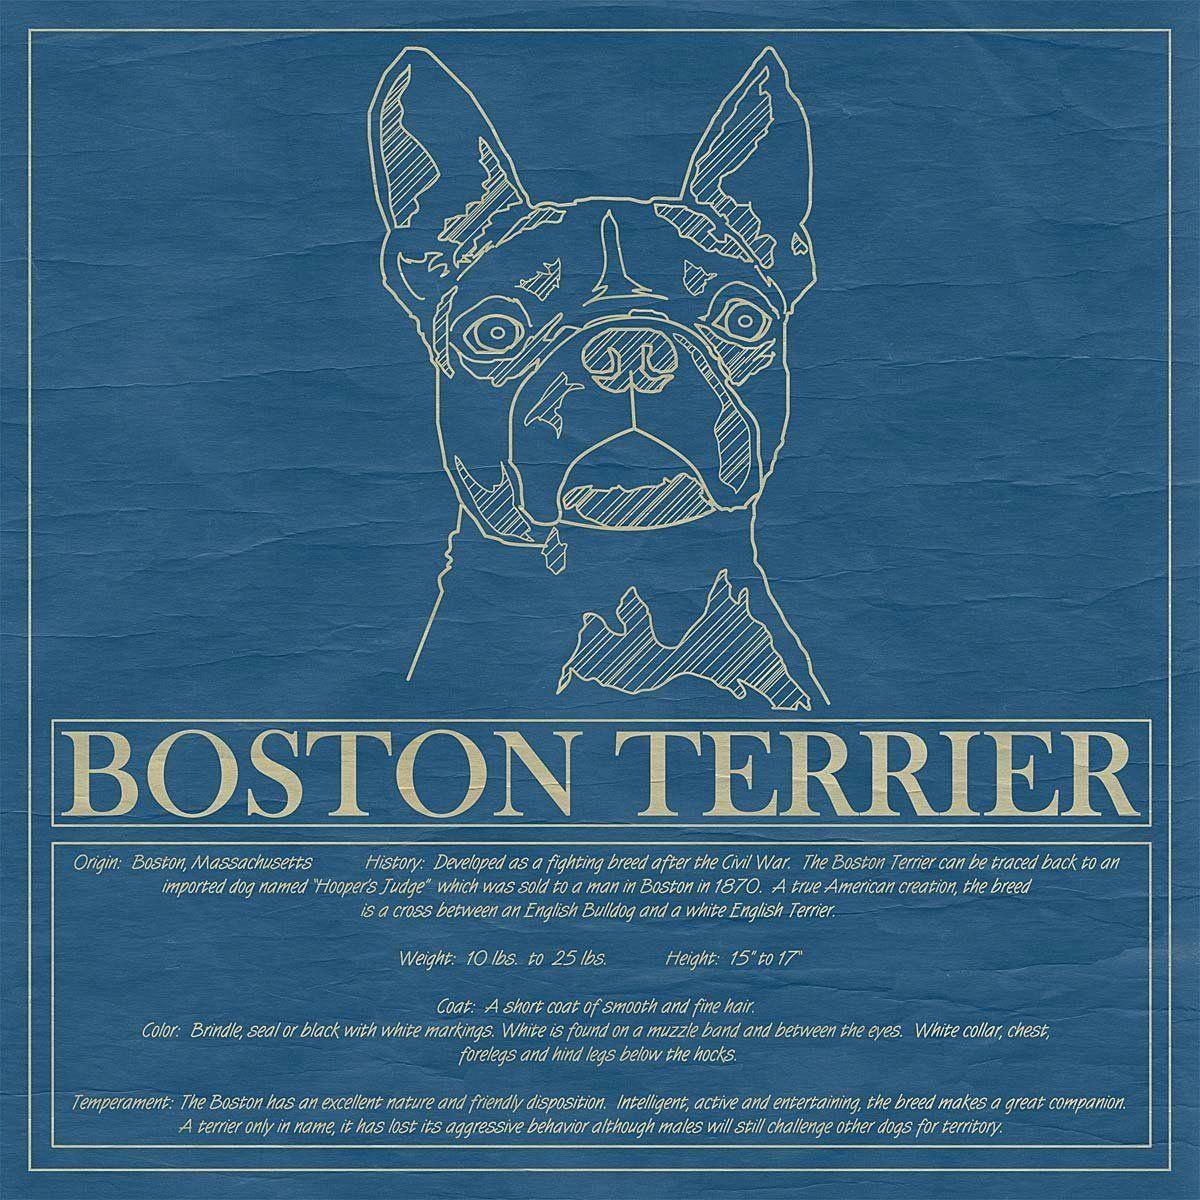 Boston Terrier Friendly And Bright Boston Terrier Boston Terrier Puppy Boston Terrier Owner